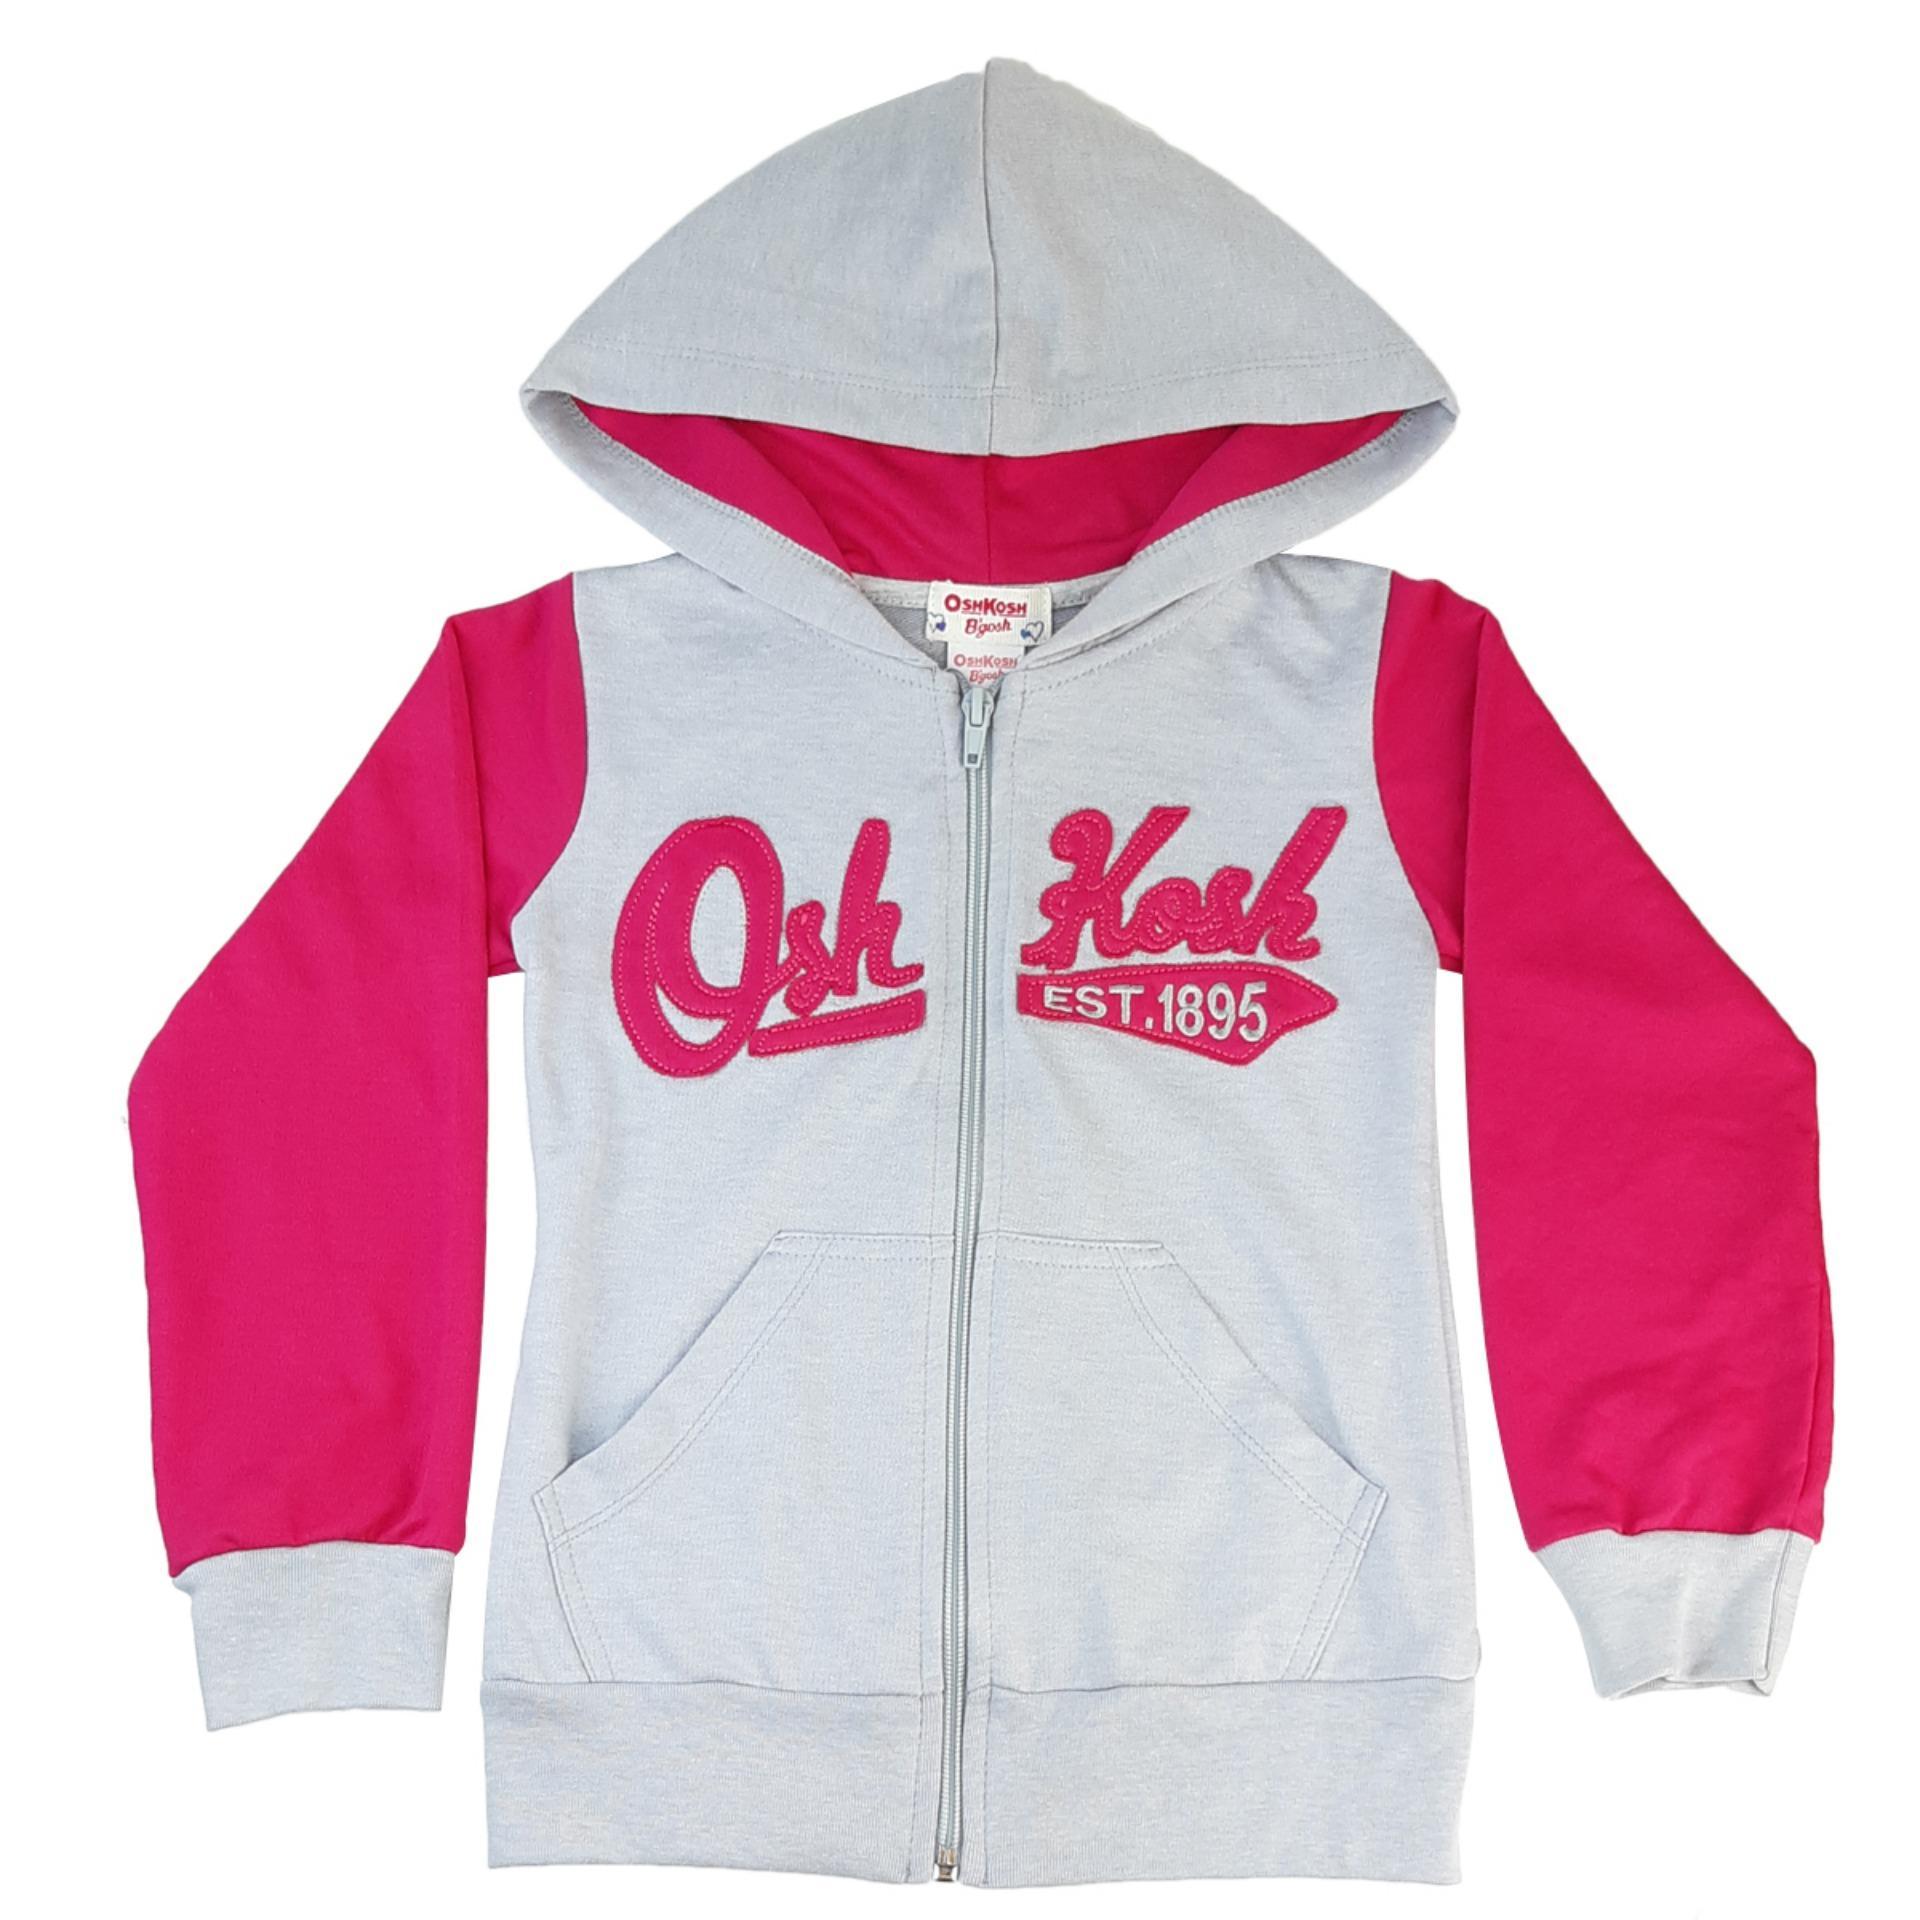 Oshkosh Girls Toddler Tops 883405 (pink) By Cinderella Philippines.